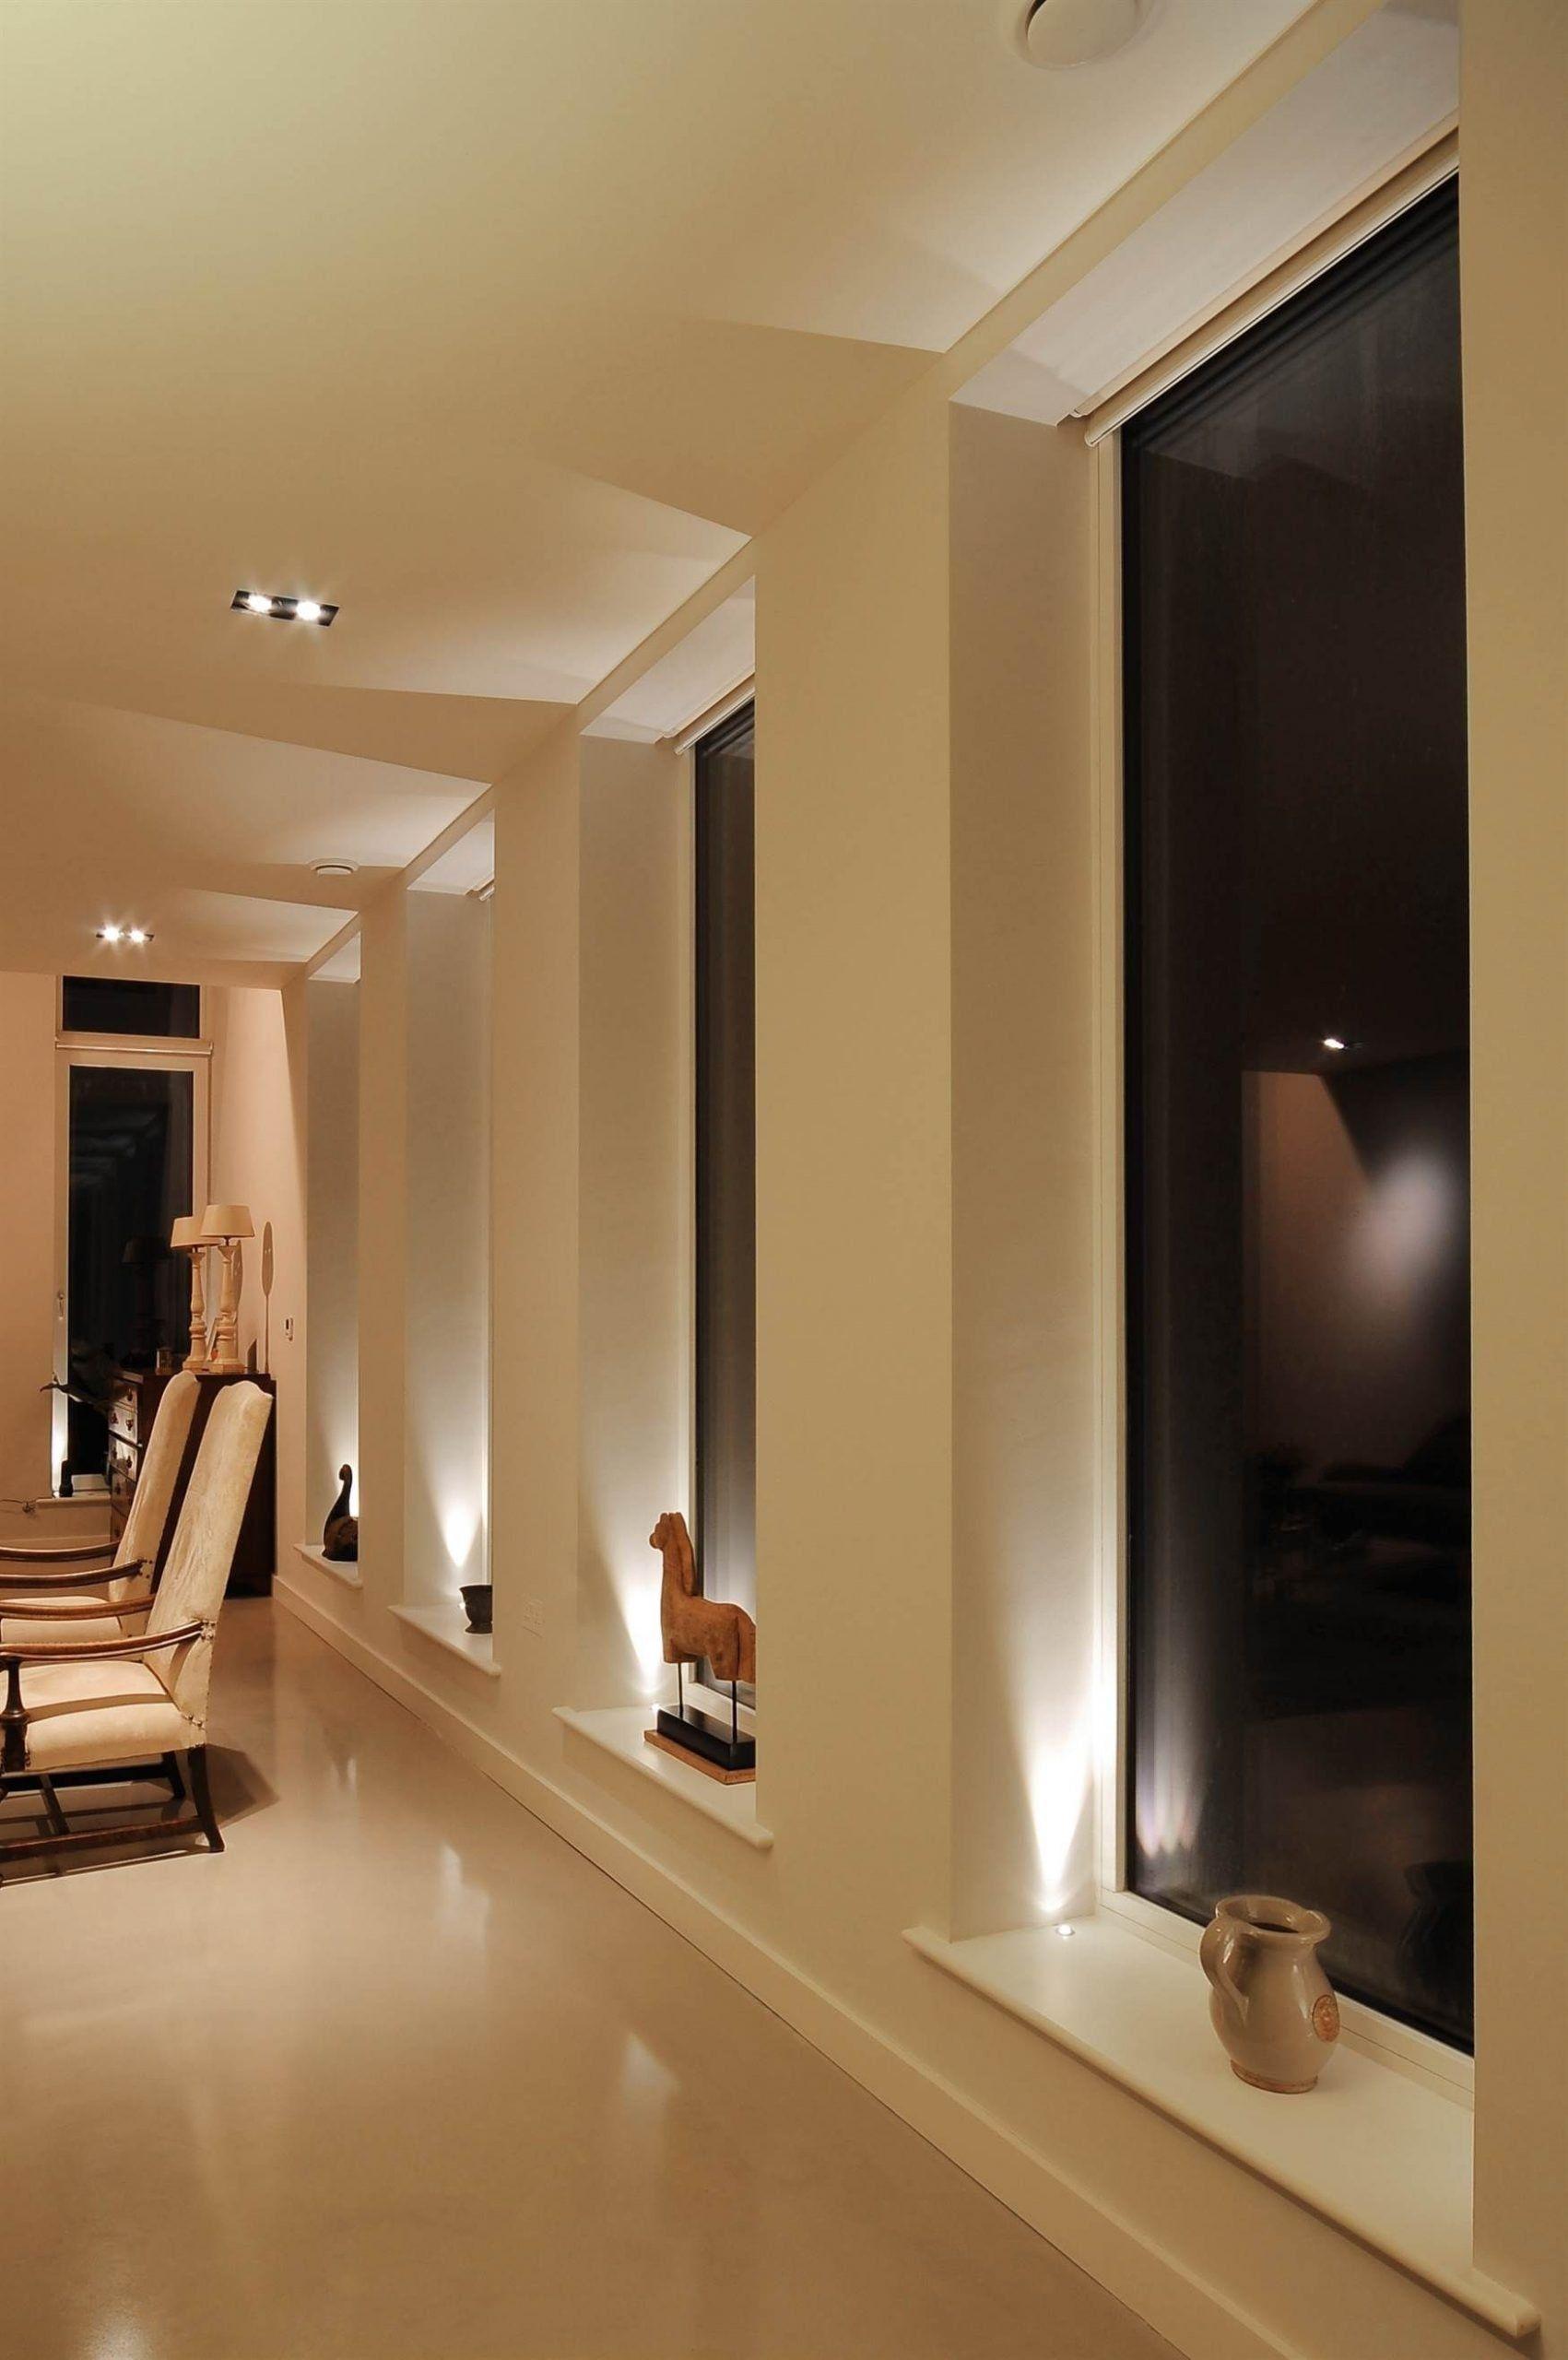 Recessed Lights Living Room Living Room Lighting Design Mr Resistor U Living Room Lighting Ideas Low Ceiling Living Room Lighting Recessed Lighting Living Room